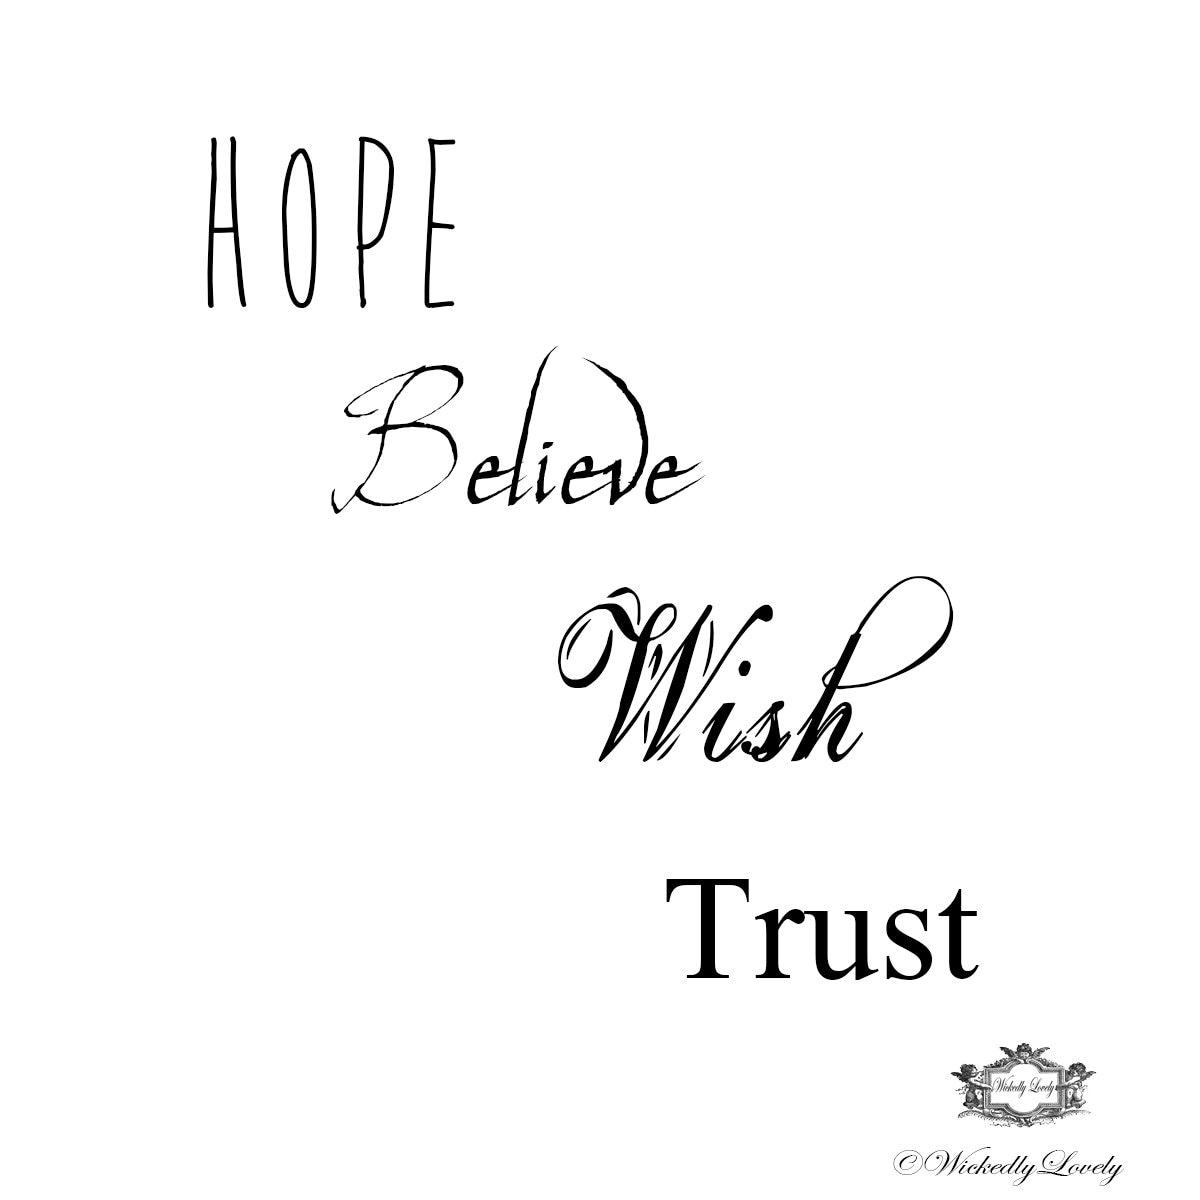 inspirational words set 3 hope believe wish trust body etsy